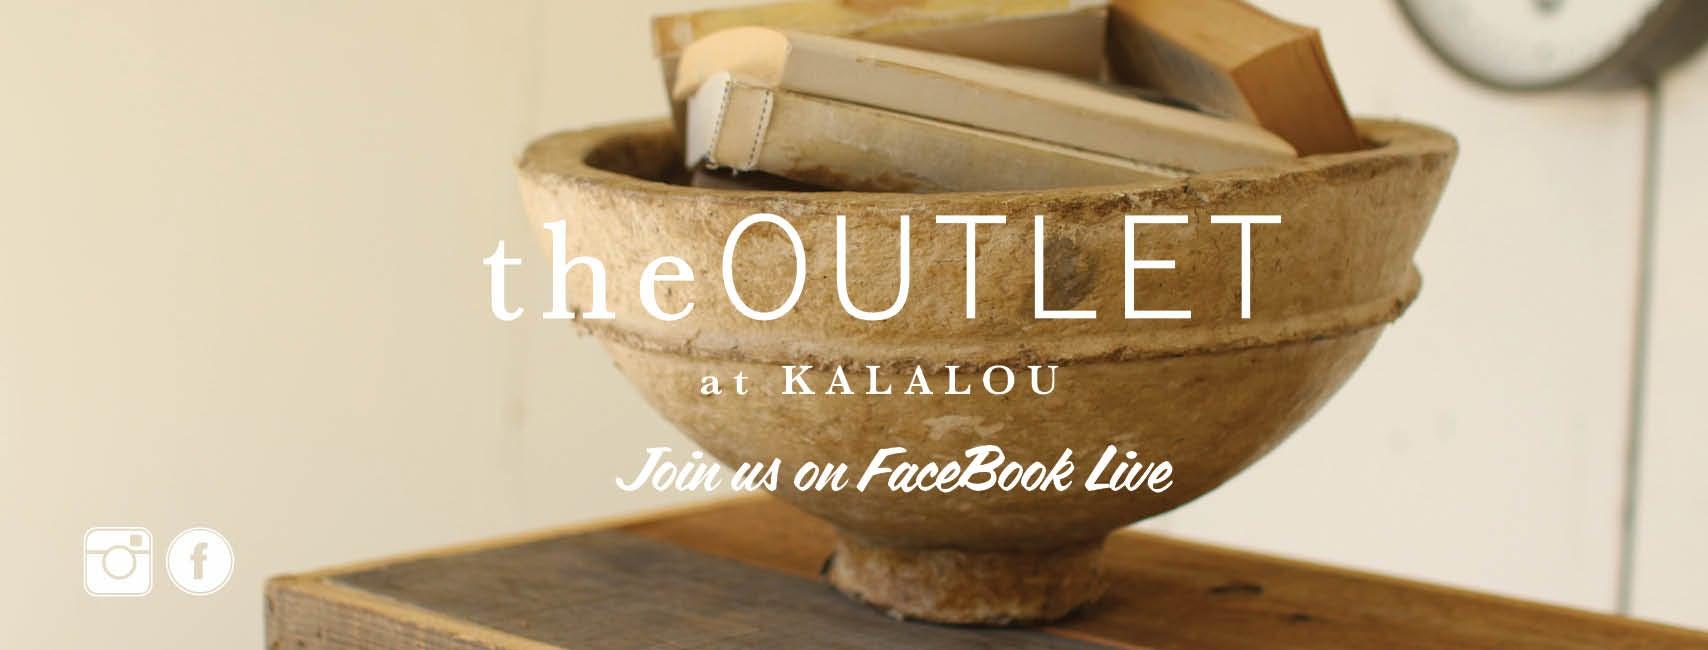 theOUTLET Facebook live